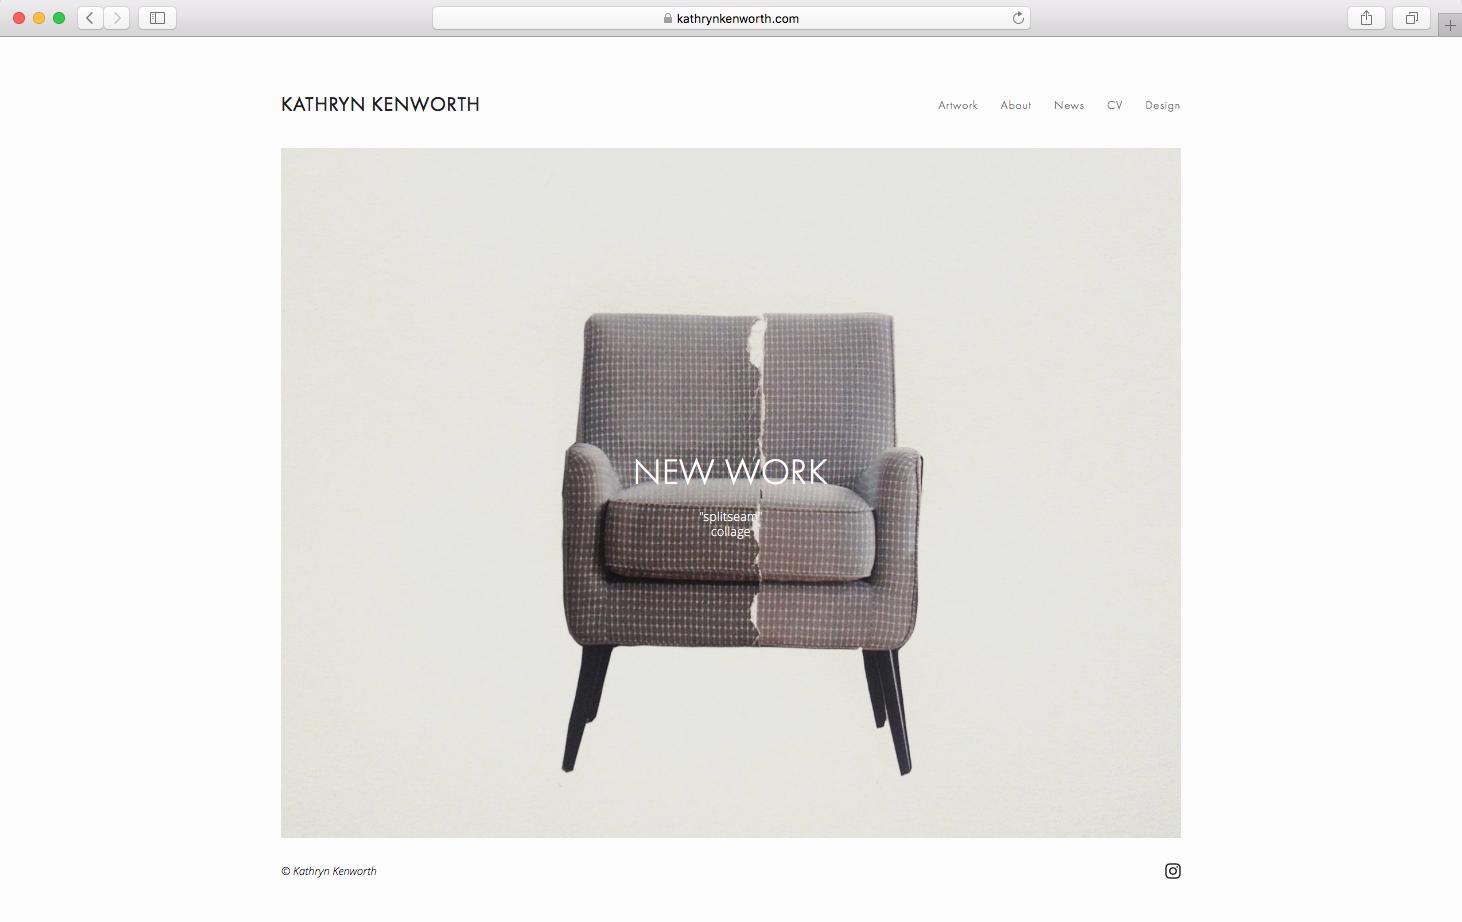 kathrynkenworth.com